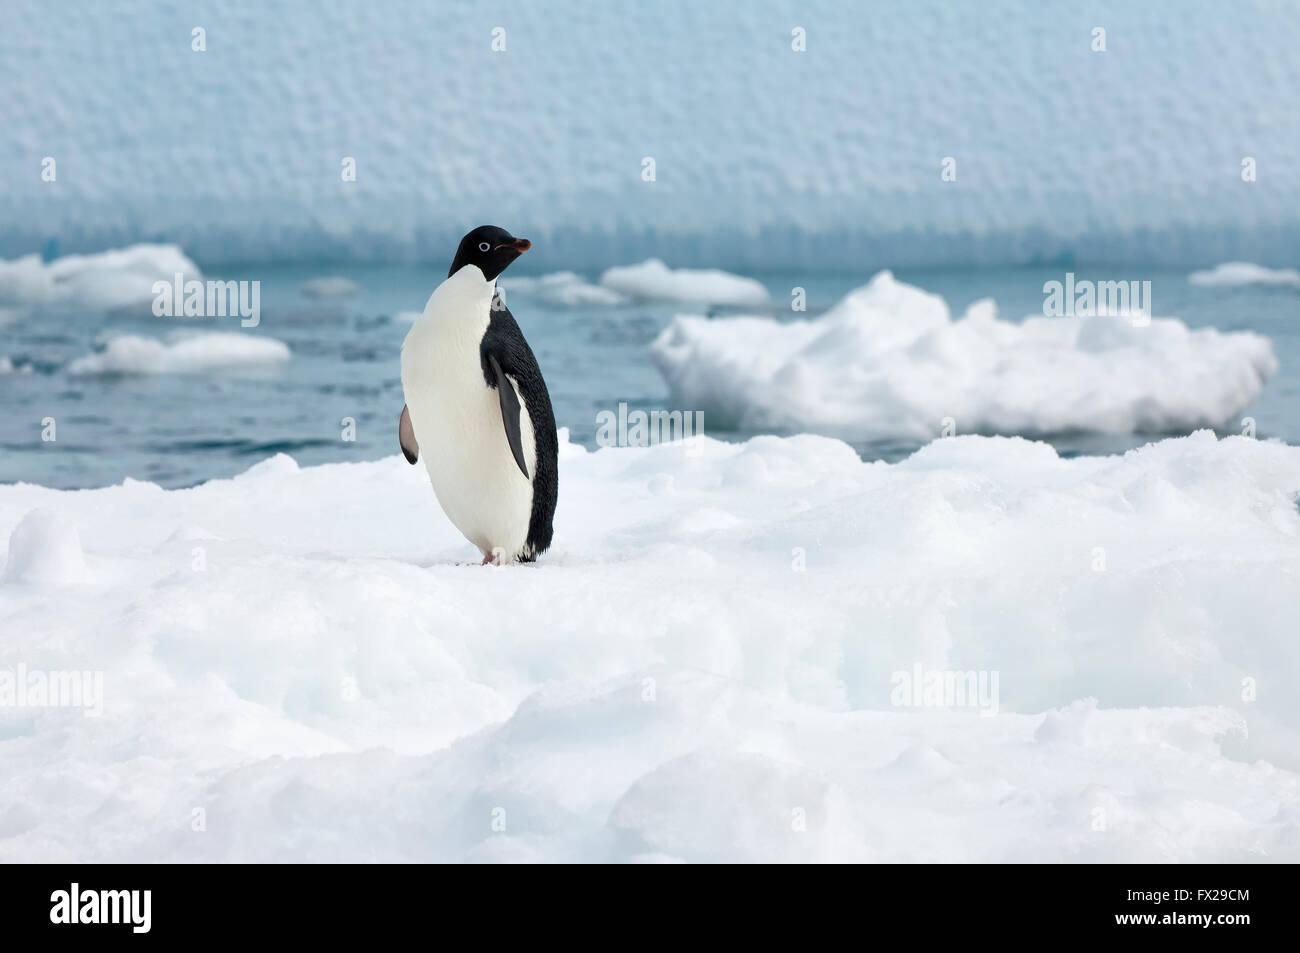 Adelie penguin (Pygoscelis adeliae) in piedi su un iceberg, Paulet Island, Erebus e terrore golfo, penisola Antartica Immagini Stock